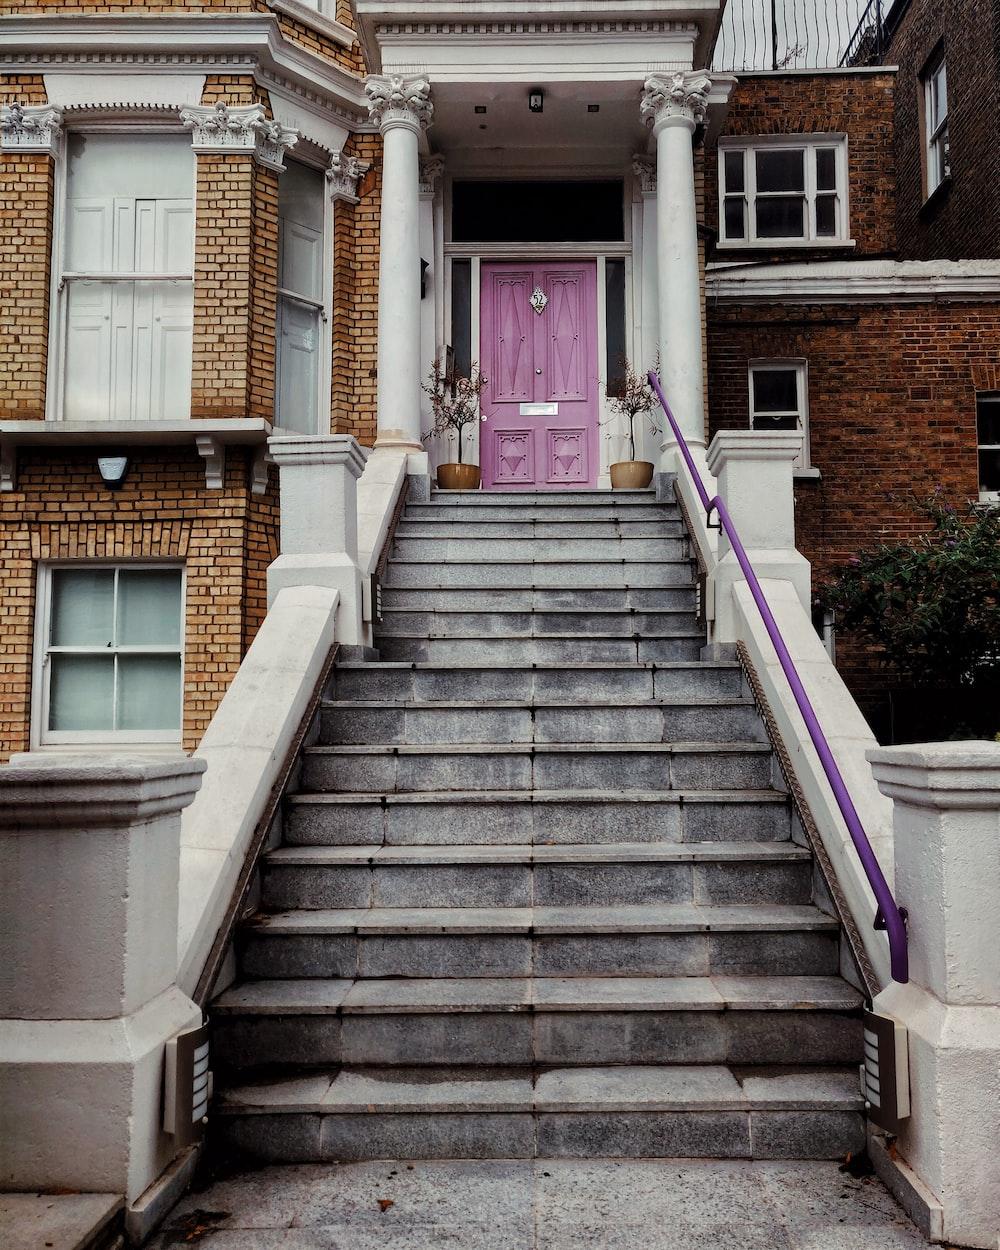 white concrete house showing closed purple wooden door